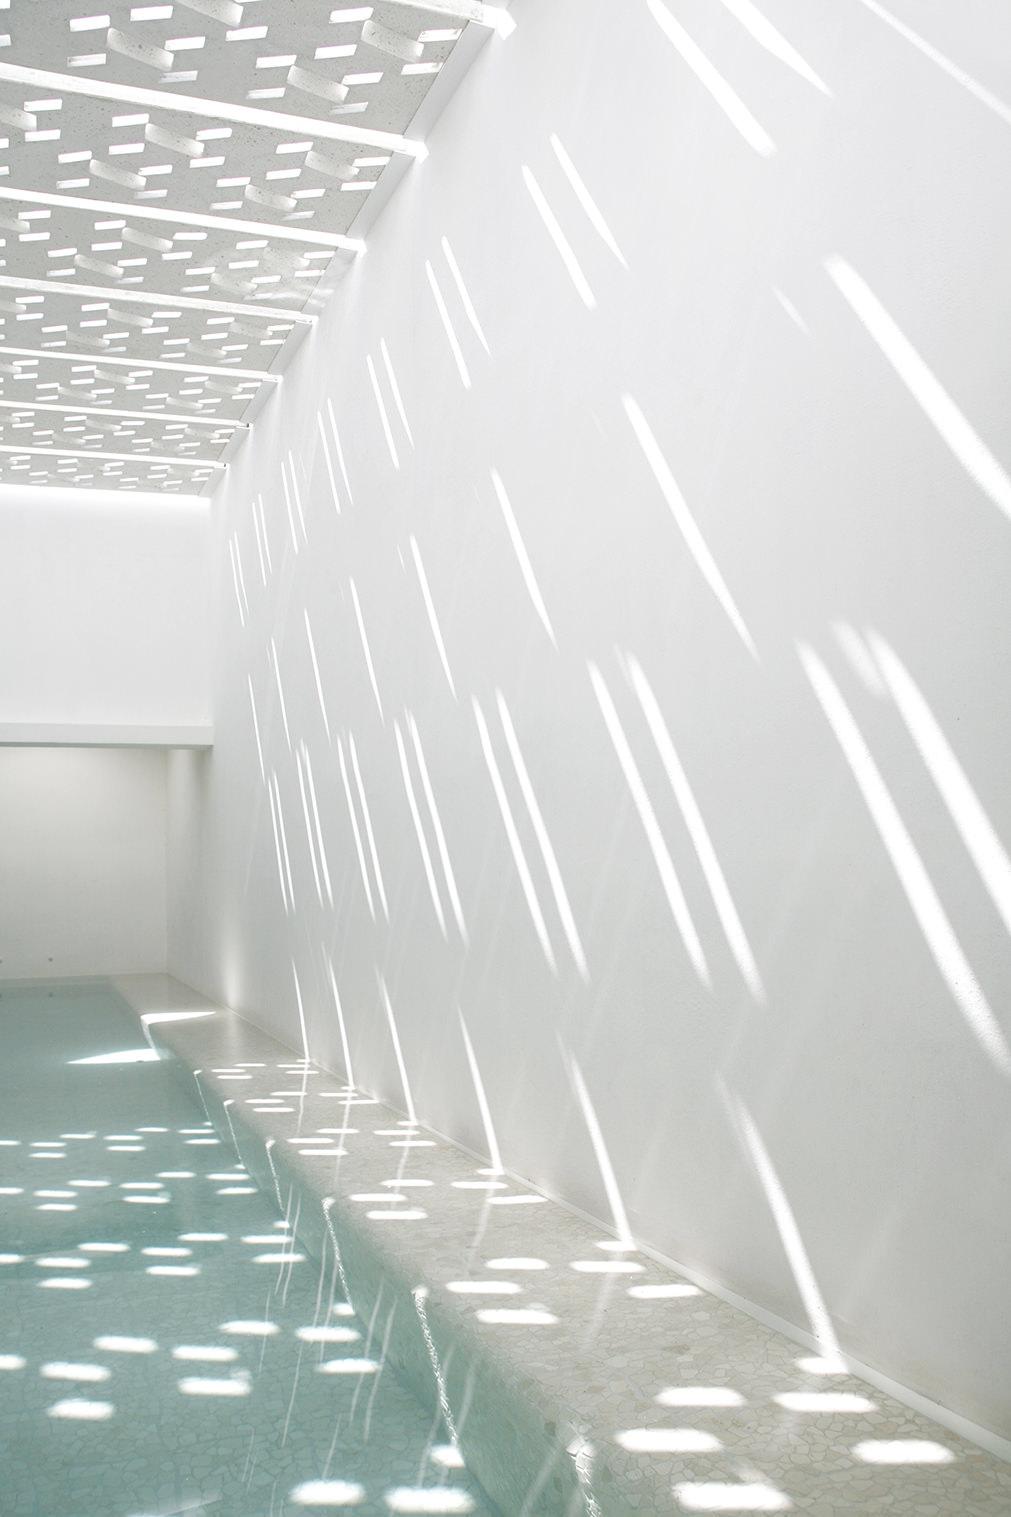 casa delpin interior pool sky shadows perforated concrete skin.jpg